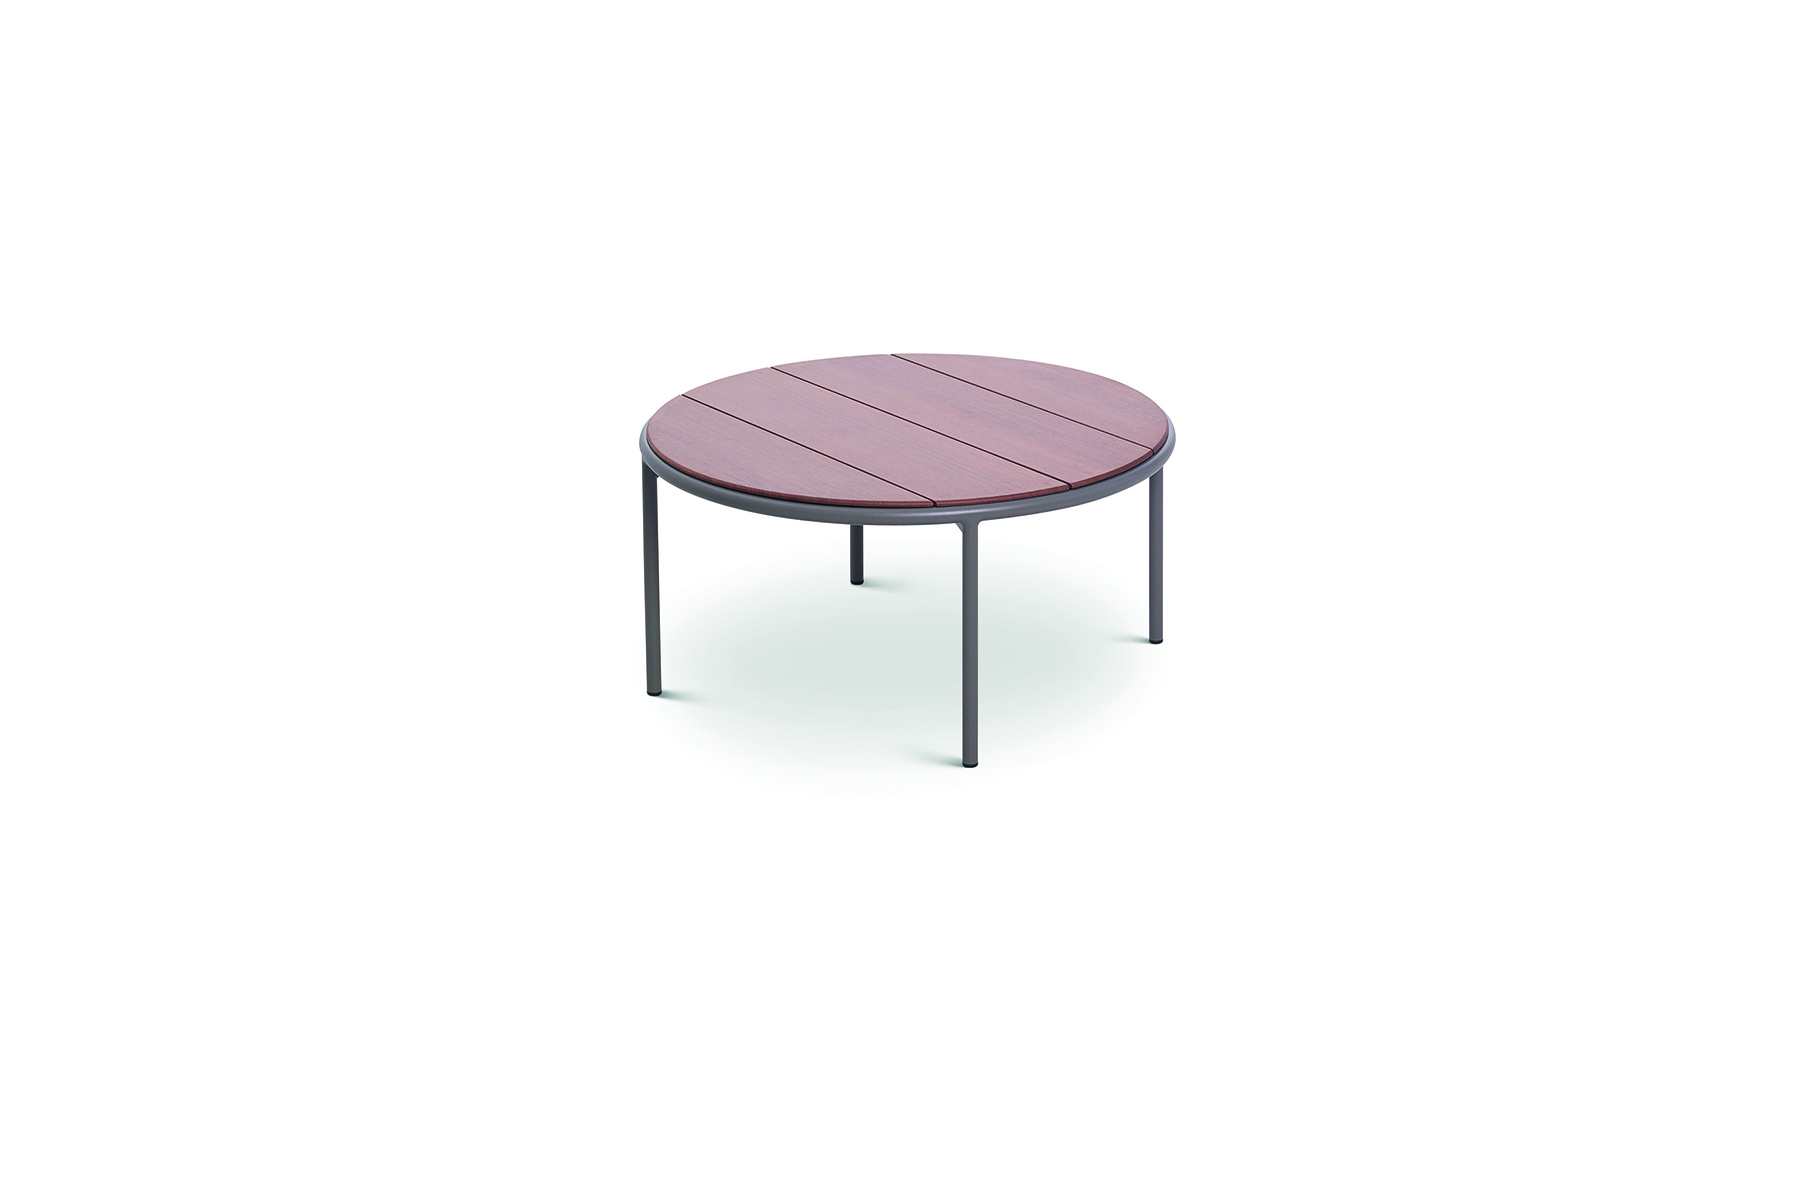 Teja IN low table Ø90 copia